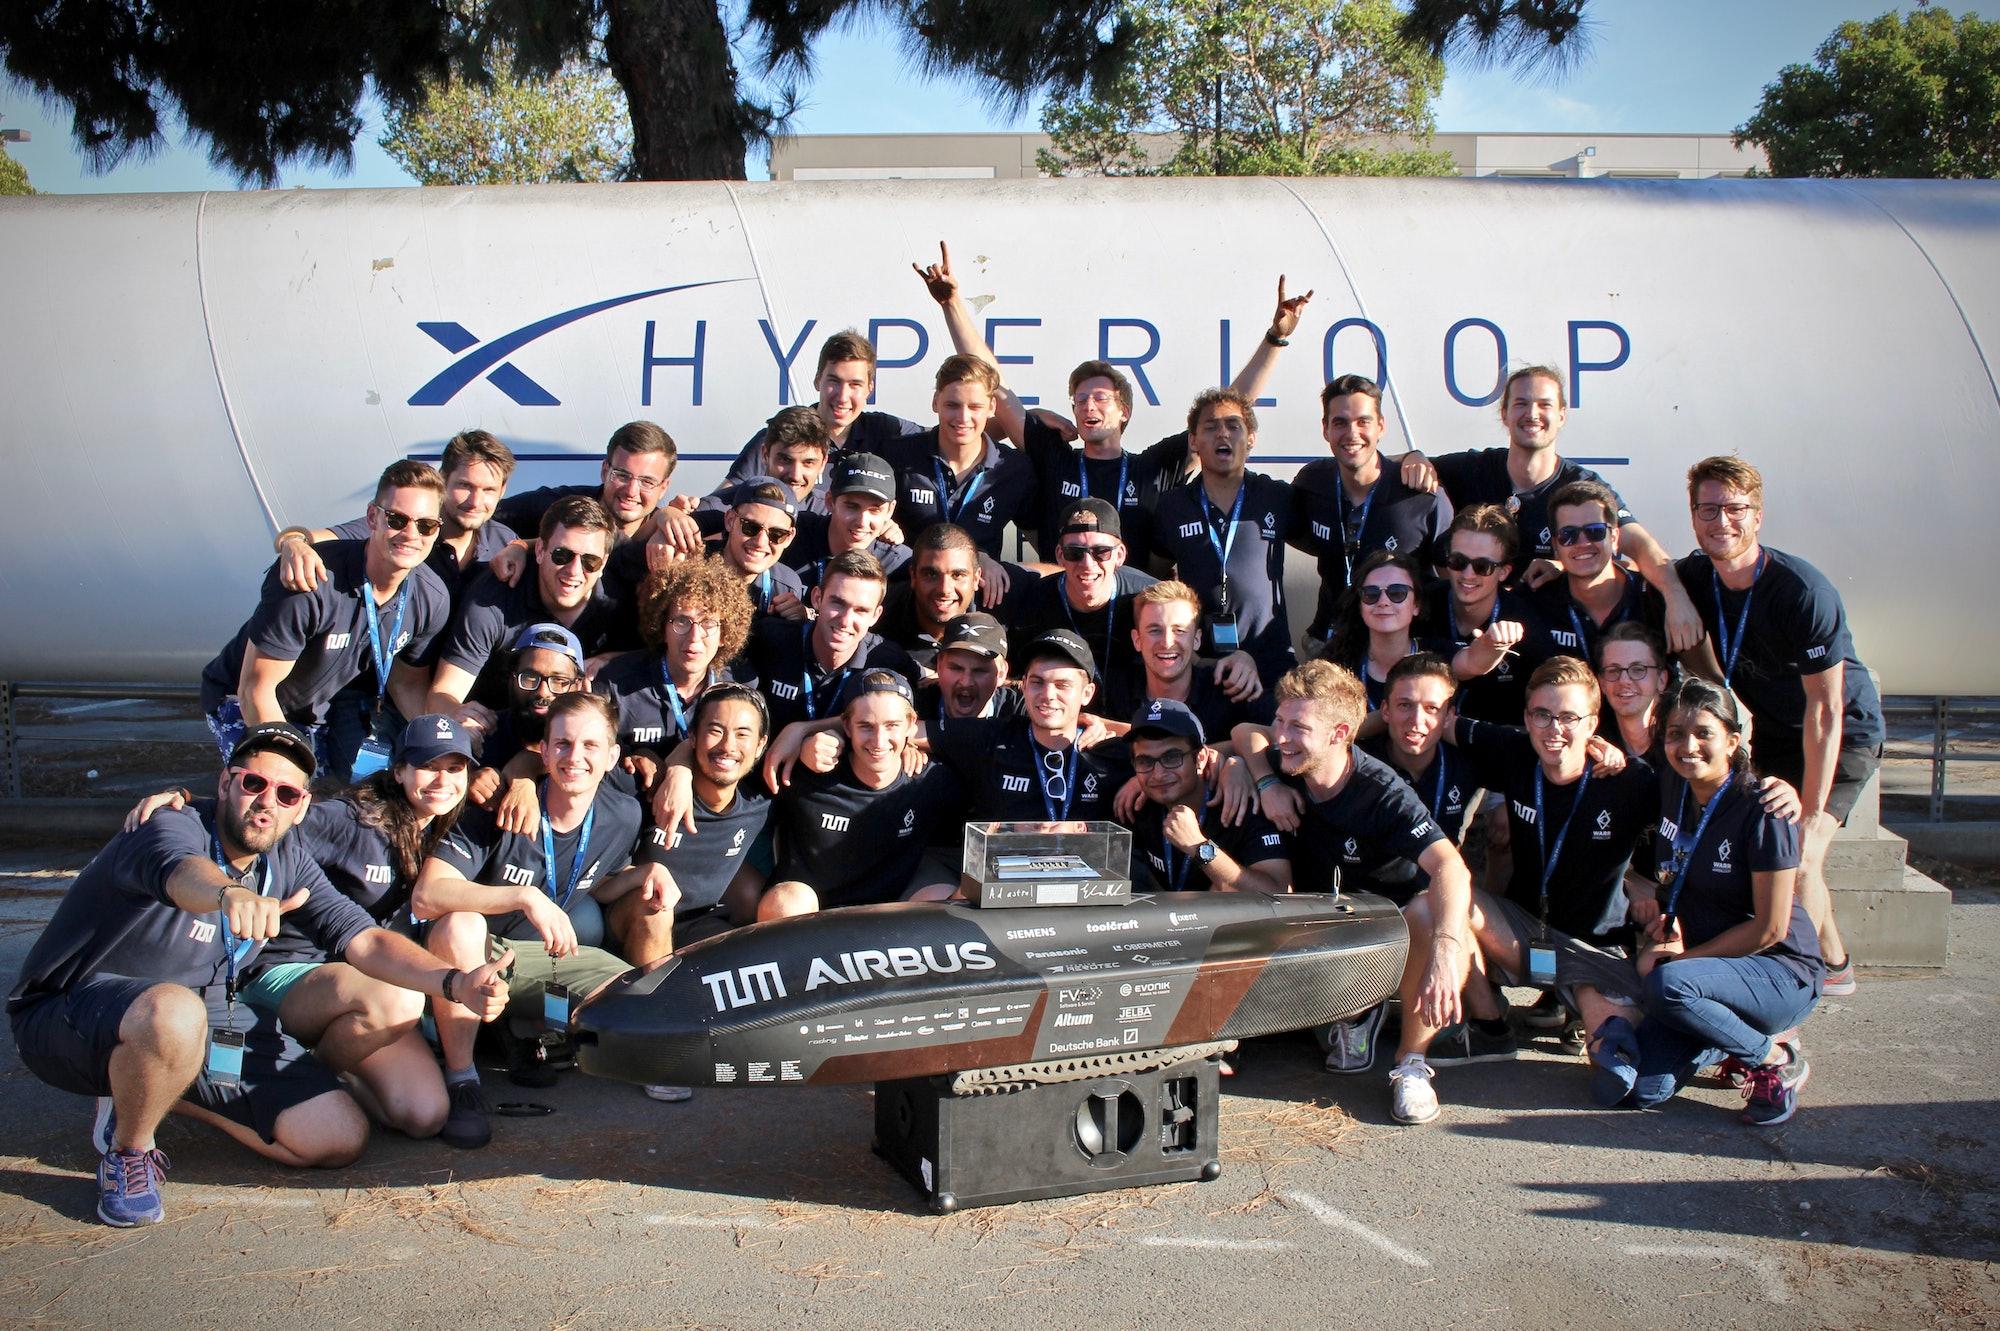 WARR Hyperloop group photo.